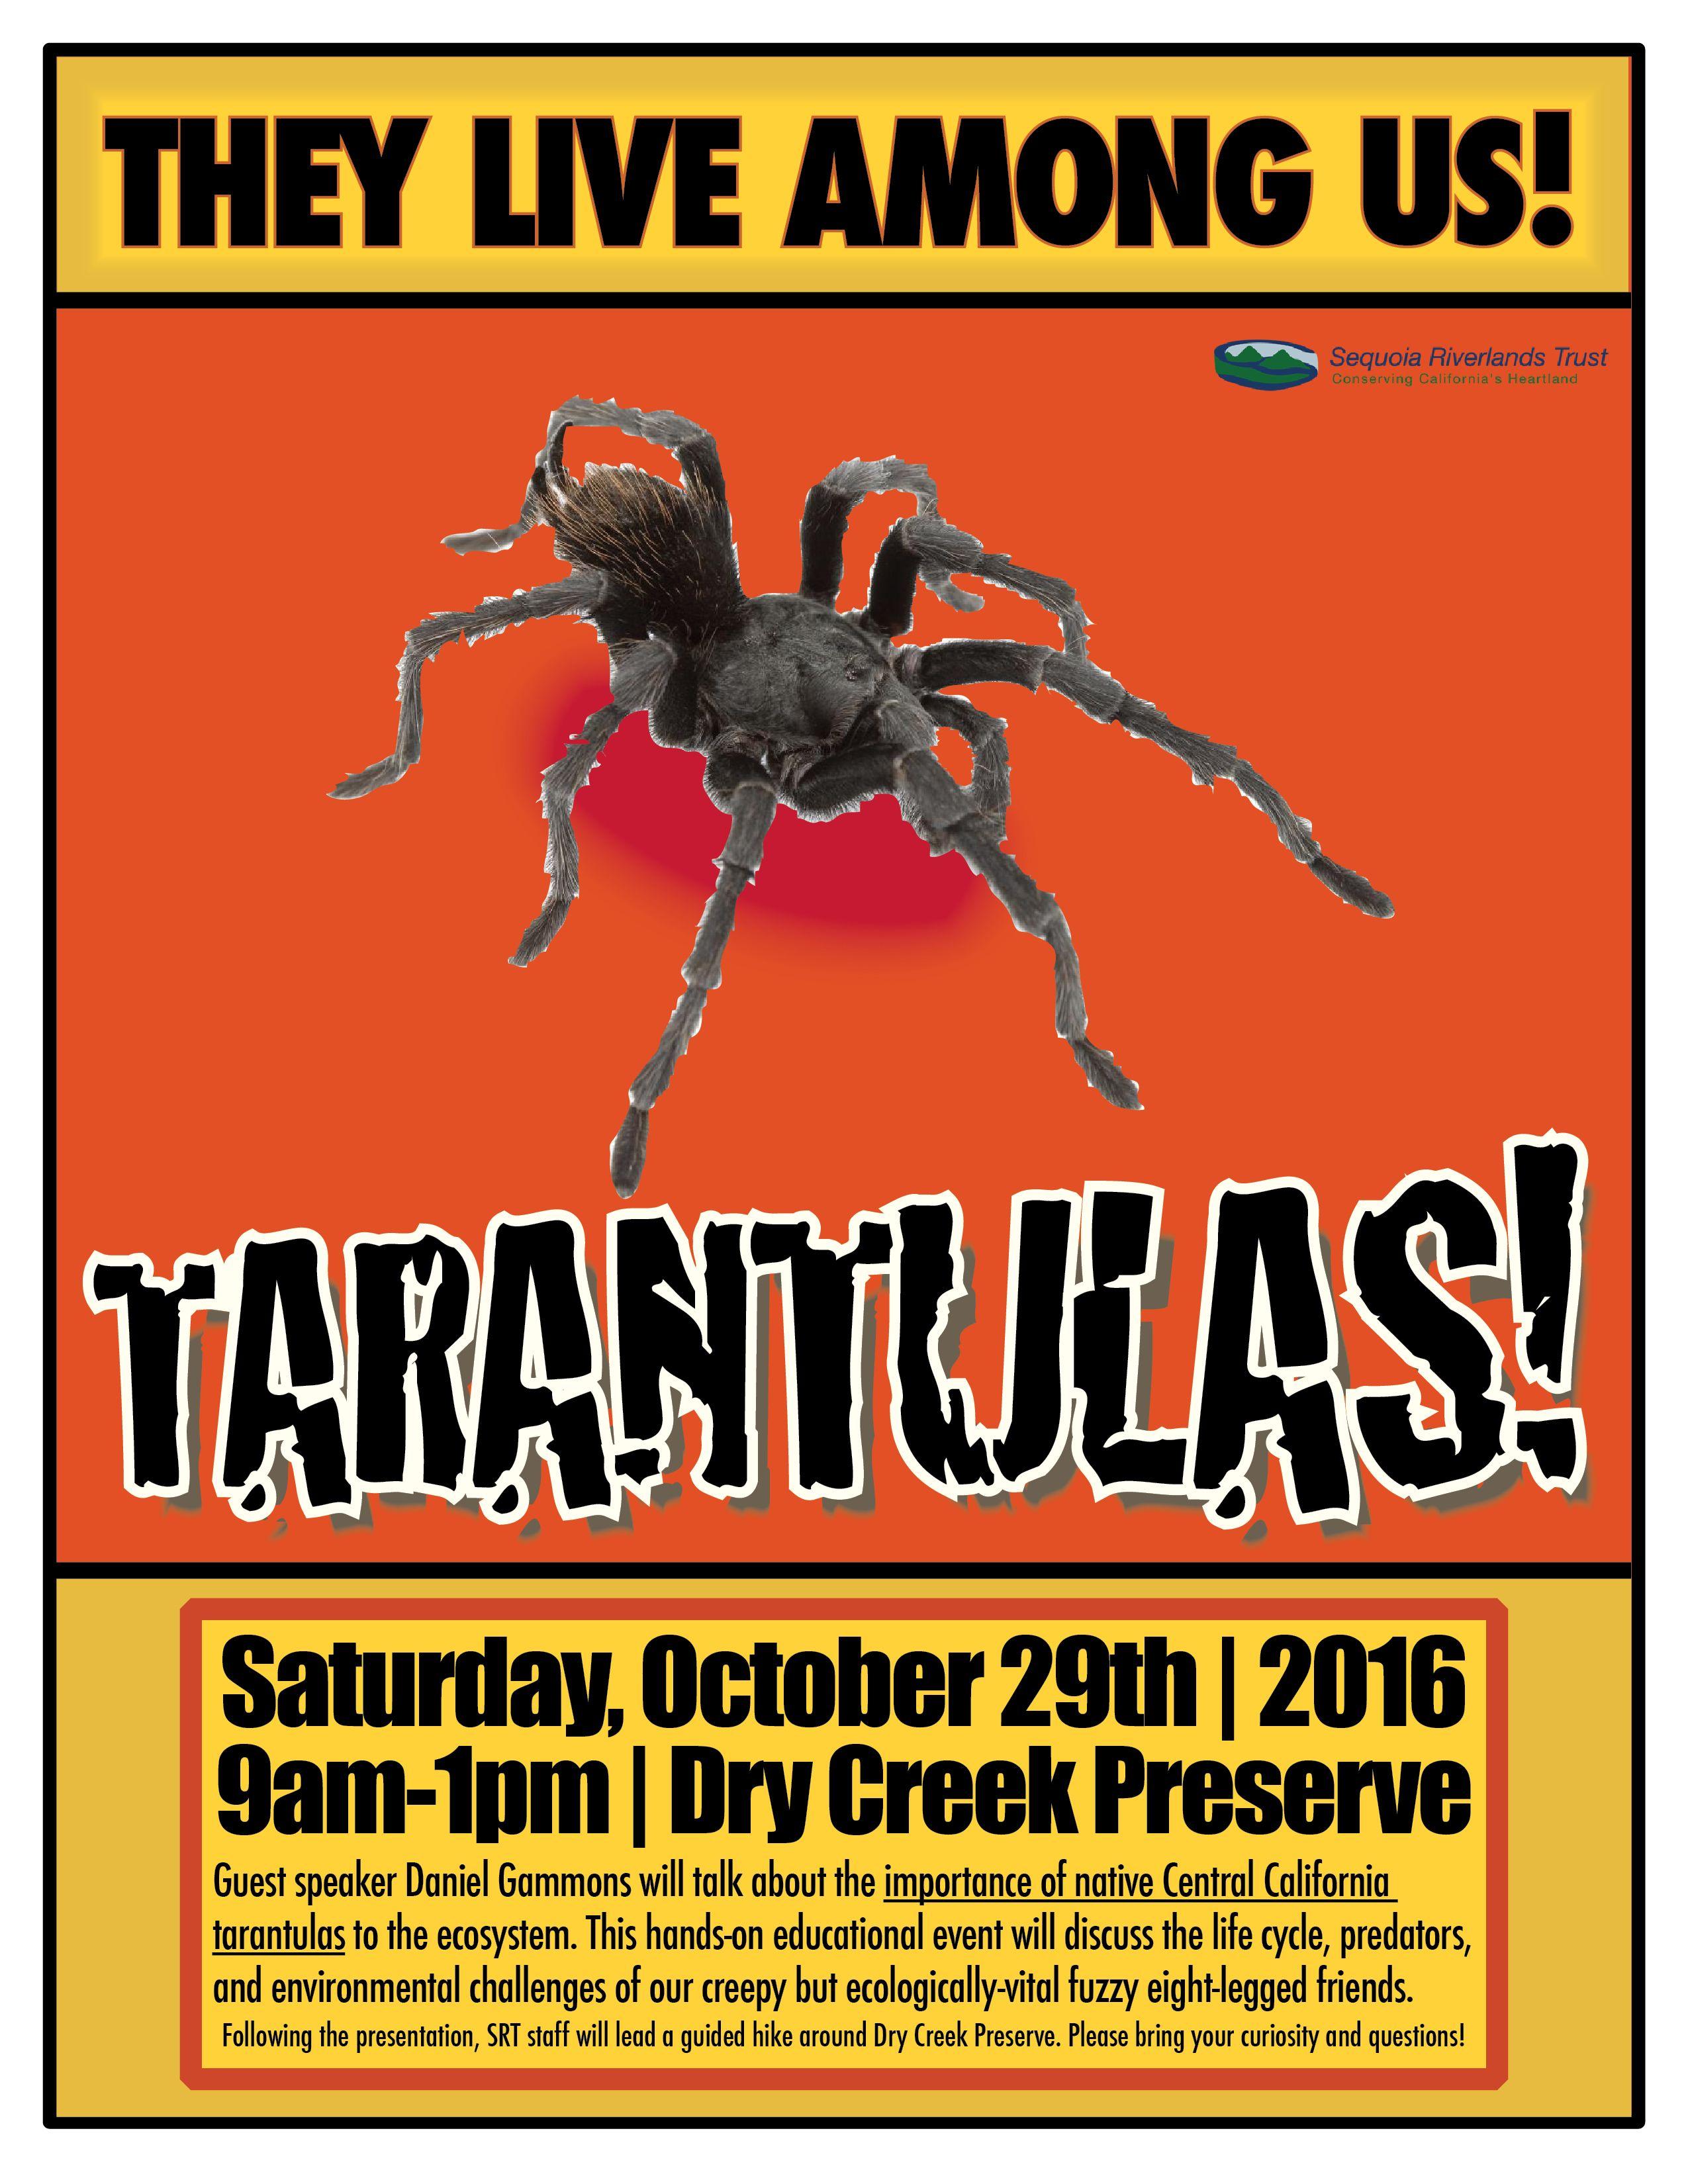 TARANTULAS at Dry Creek Preserve!